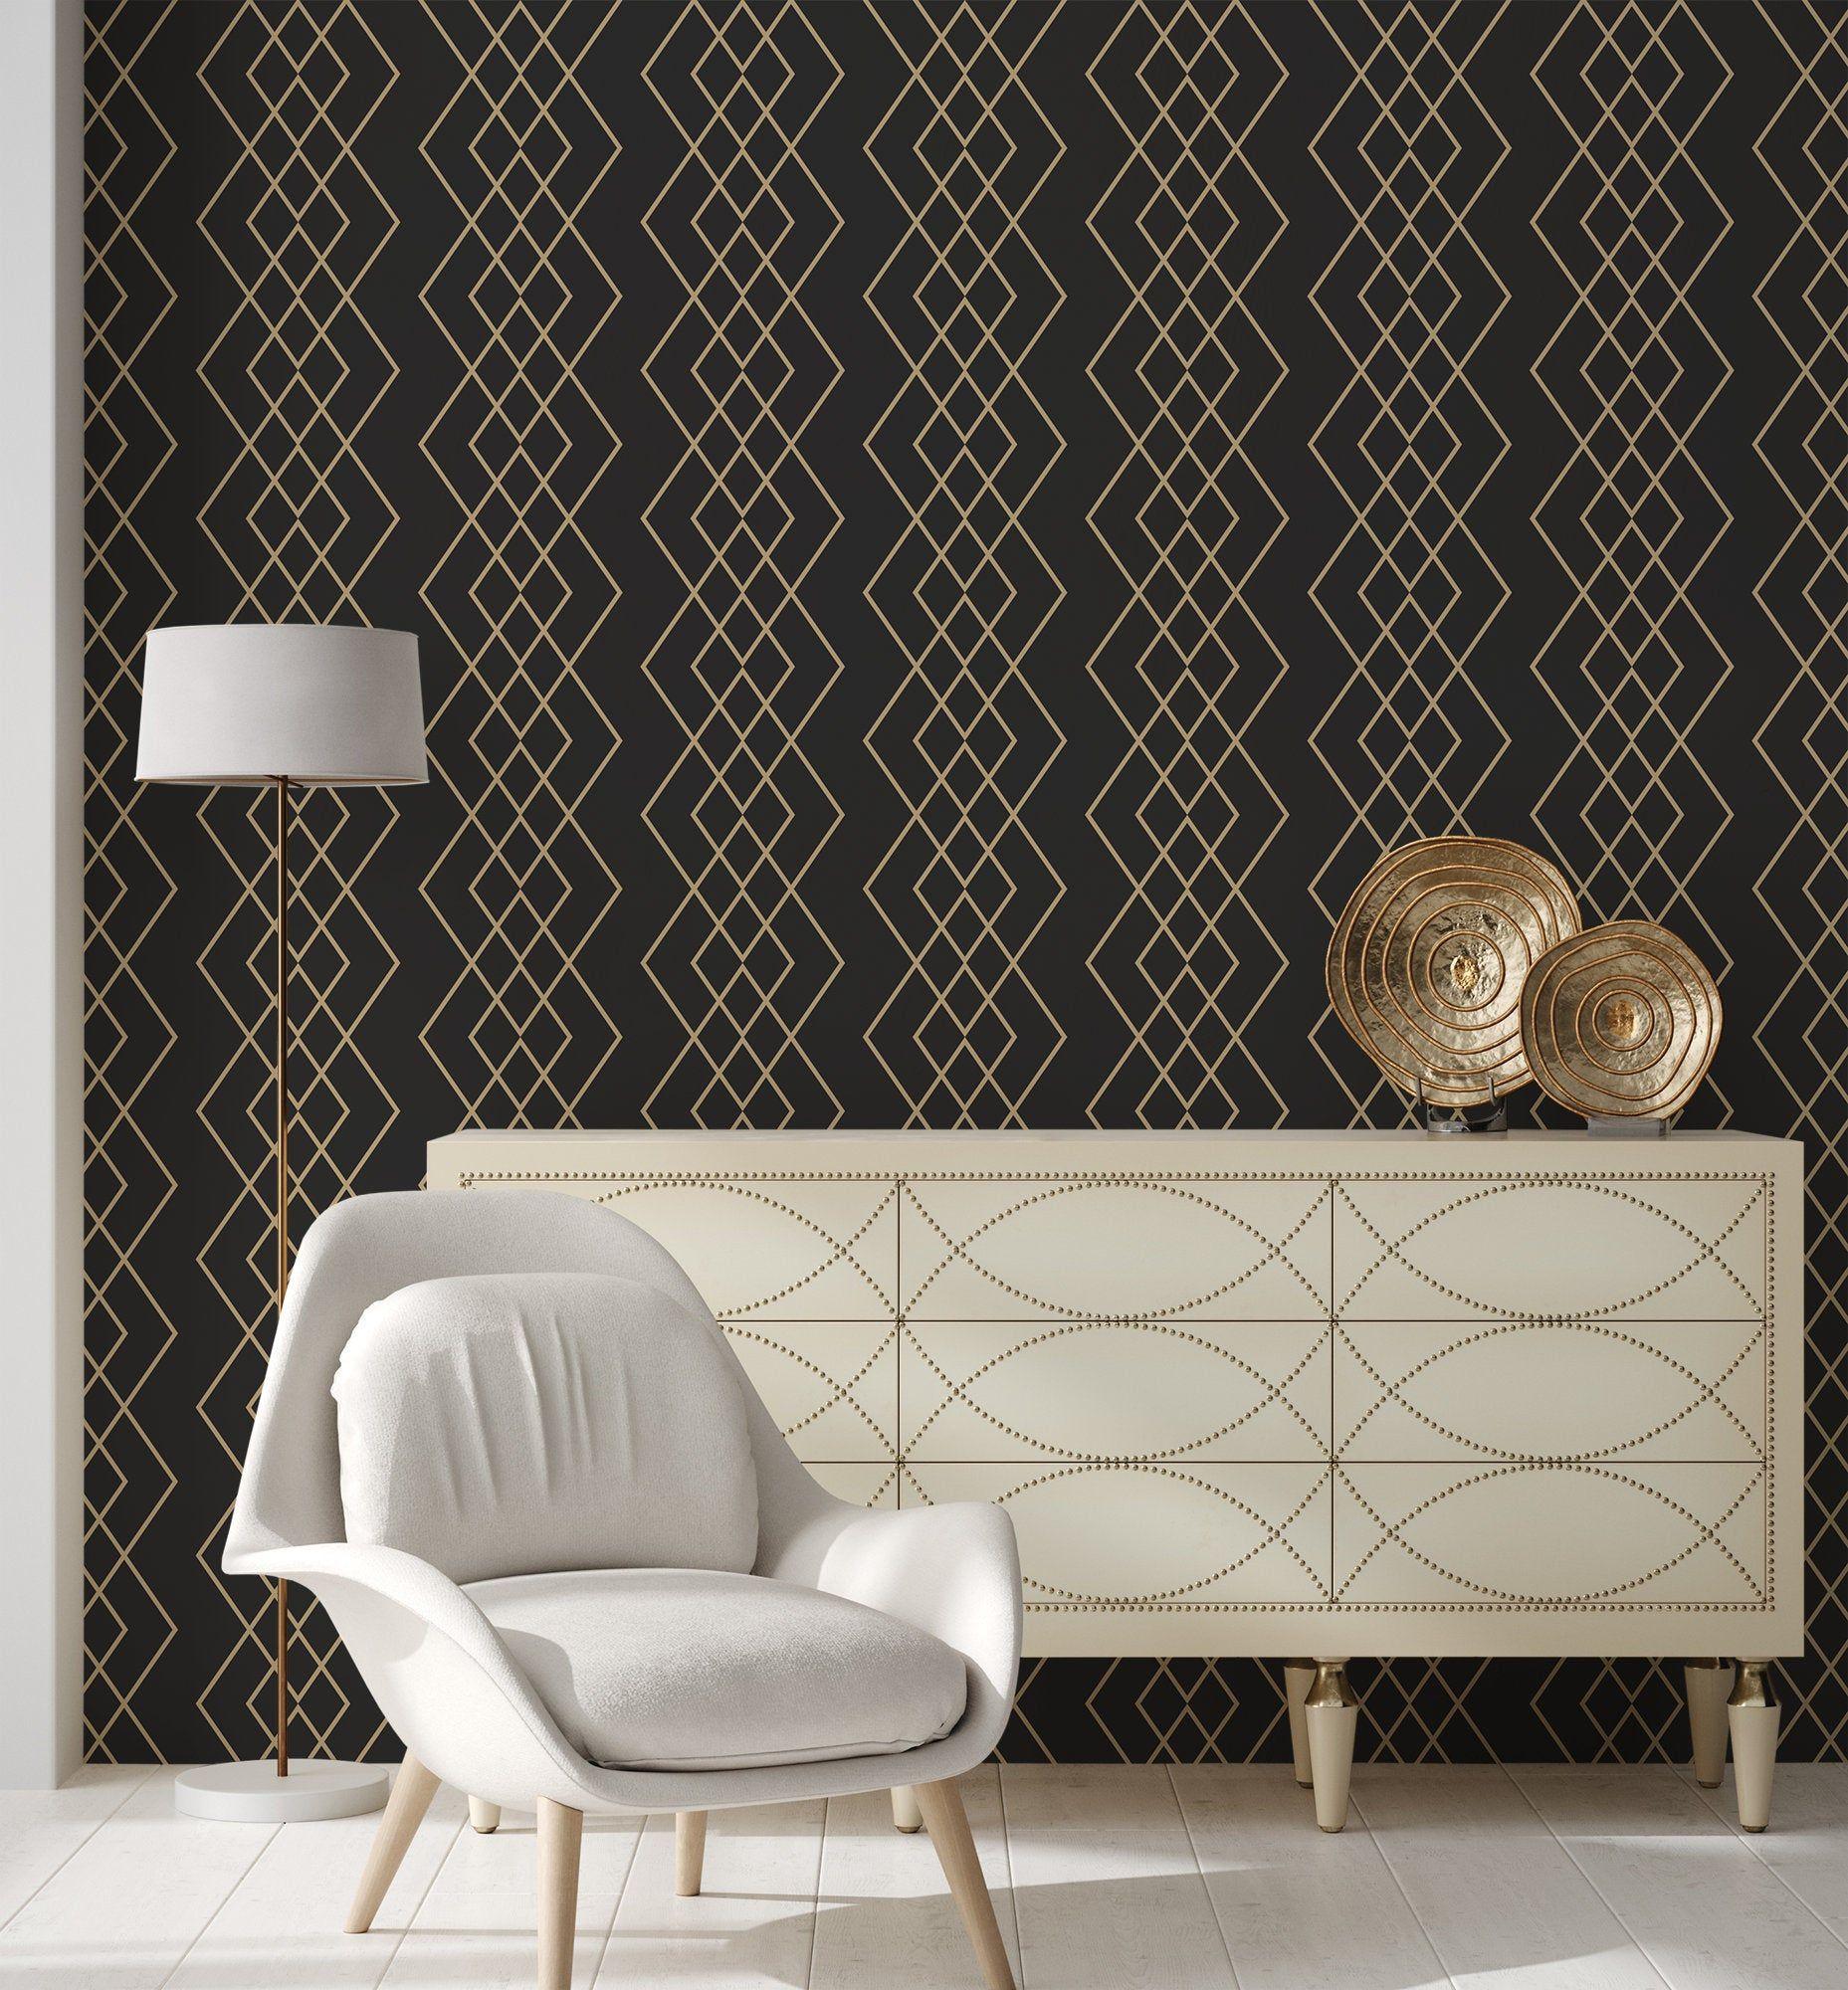 Black Wallpaper With Gold Diamond Pattern No Metallic Effects Self Adhesive Peel Stick Repositionable Removable Wallpaper Gold Wallpaper Black Wallpaper Removable Wallpaper